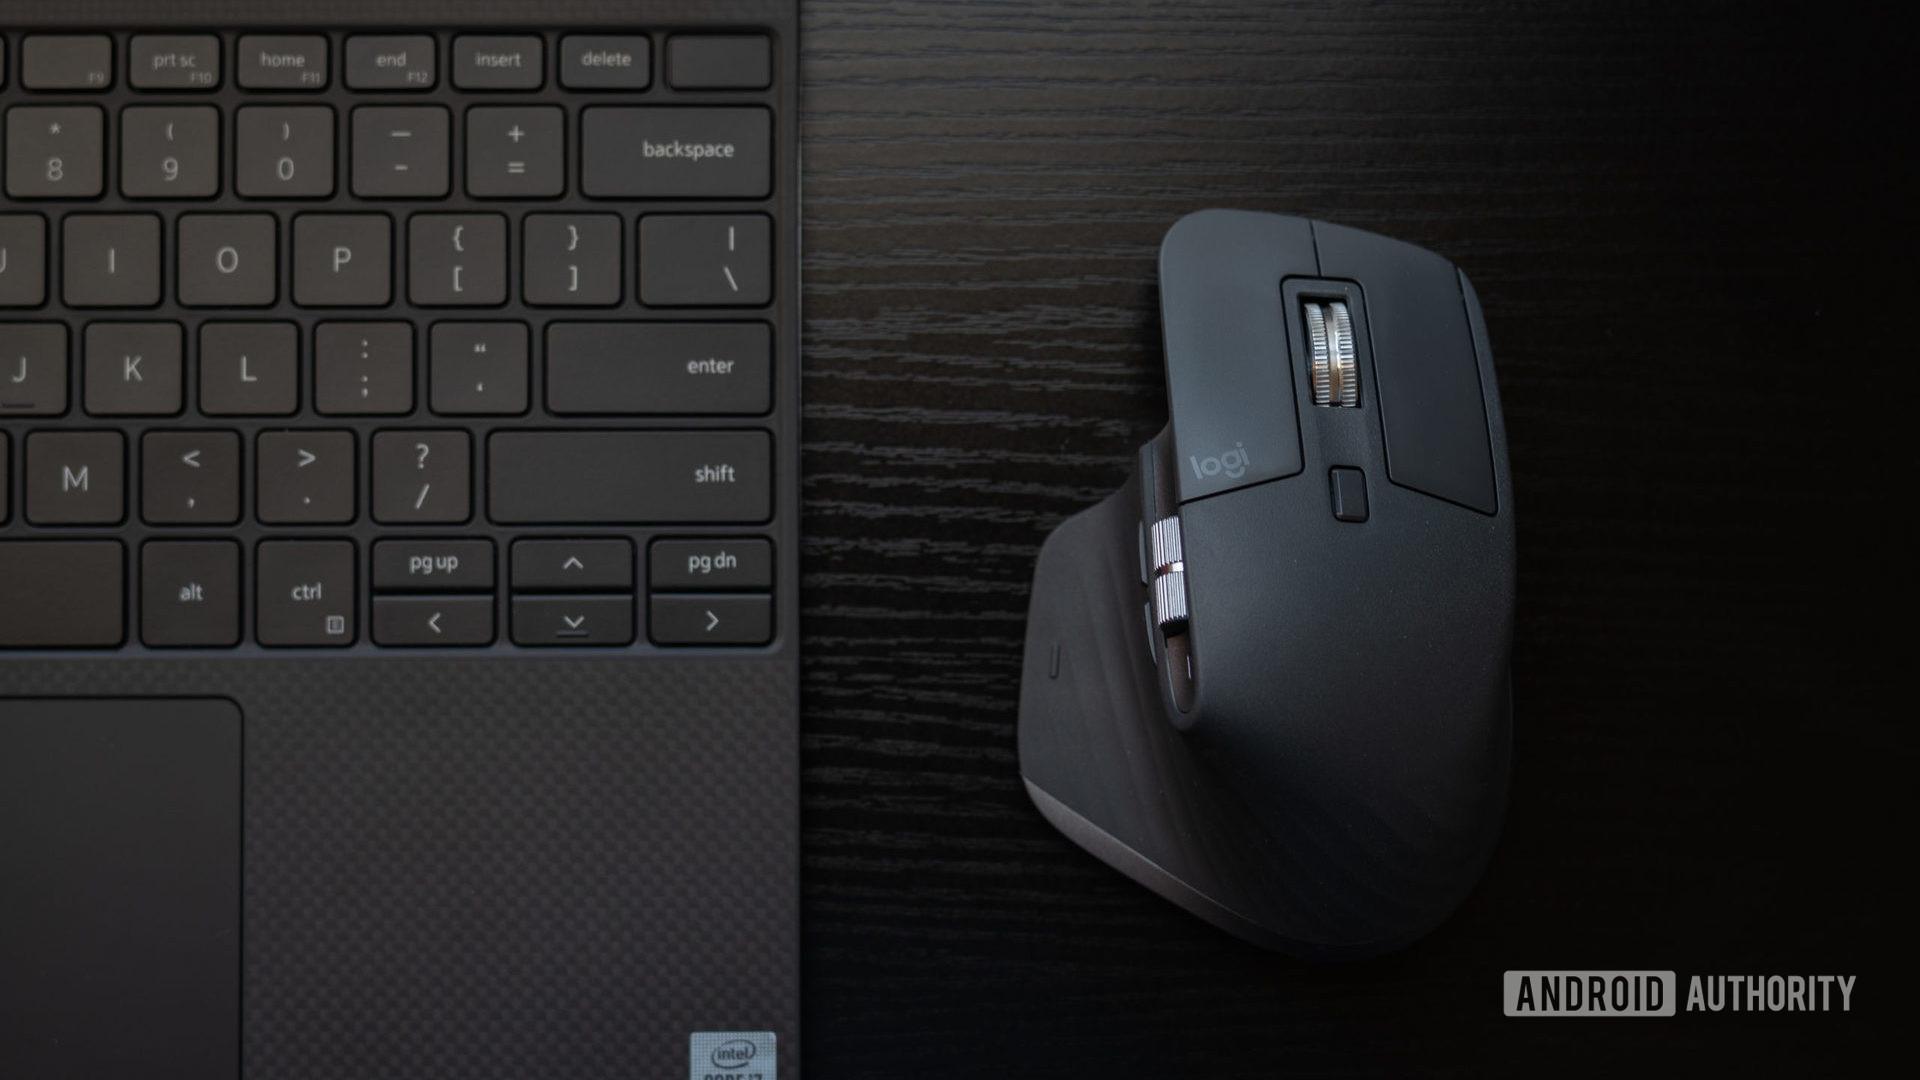 MX Master 3 beside laptop